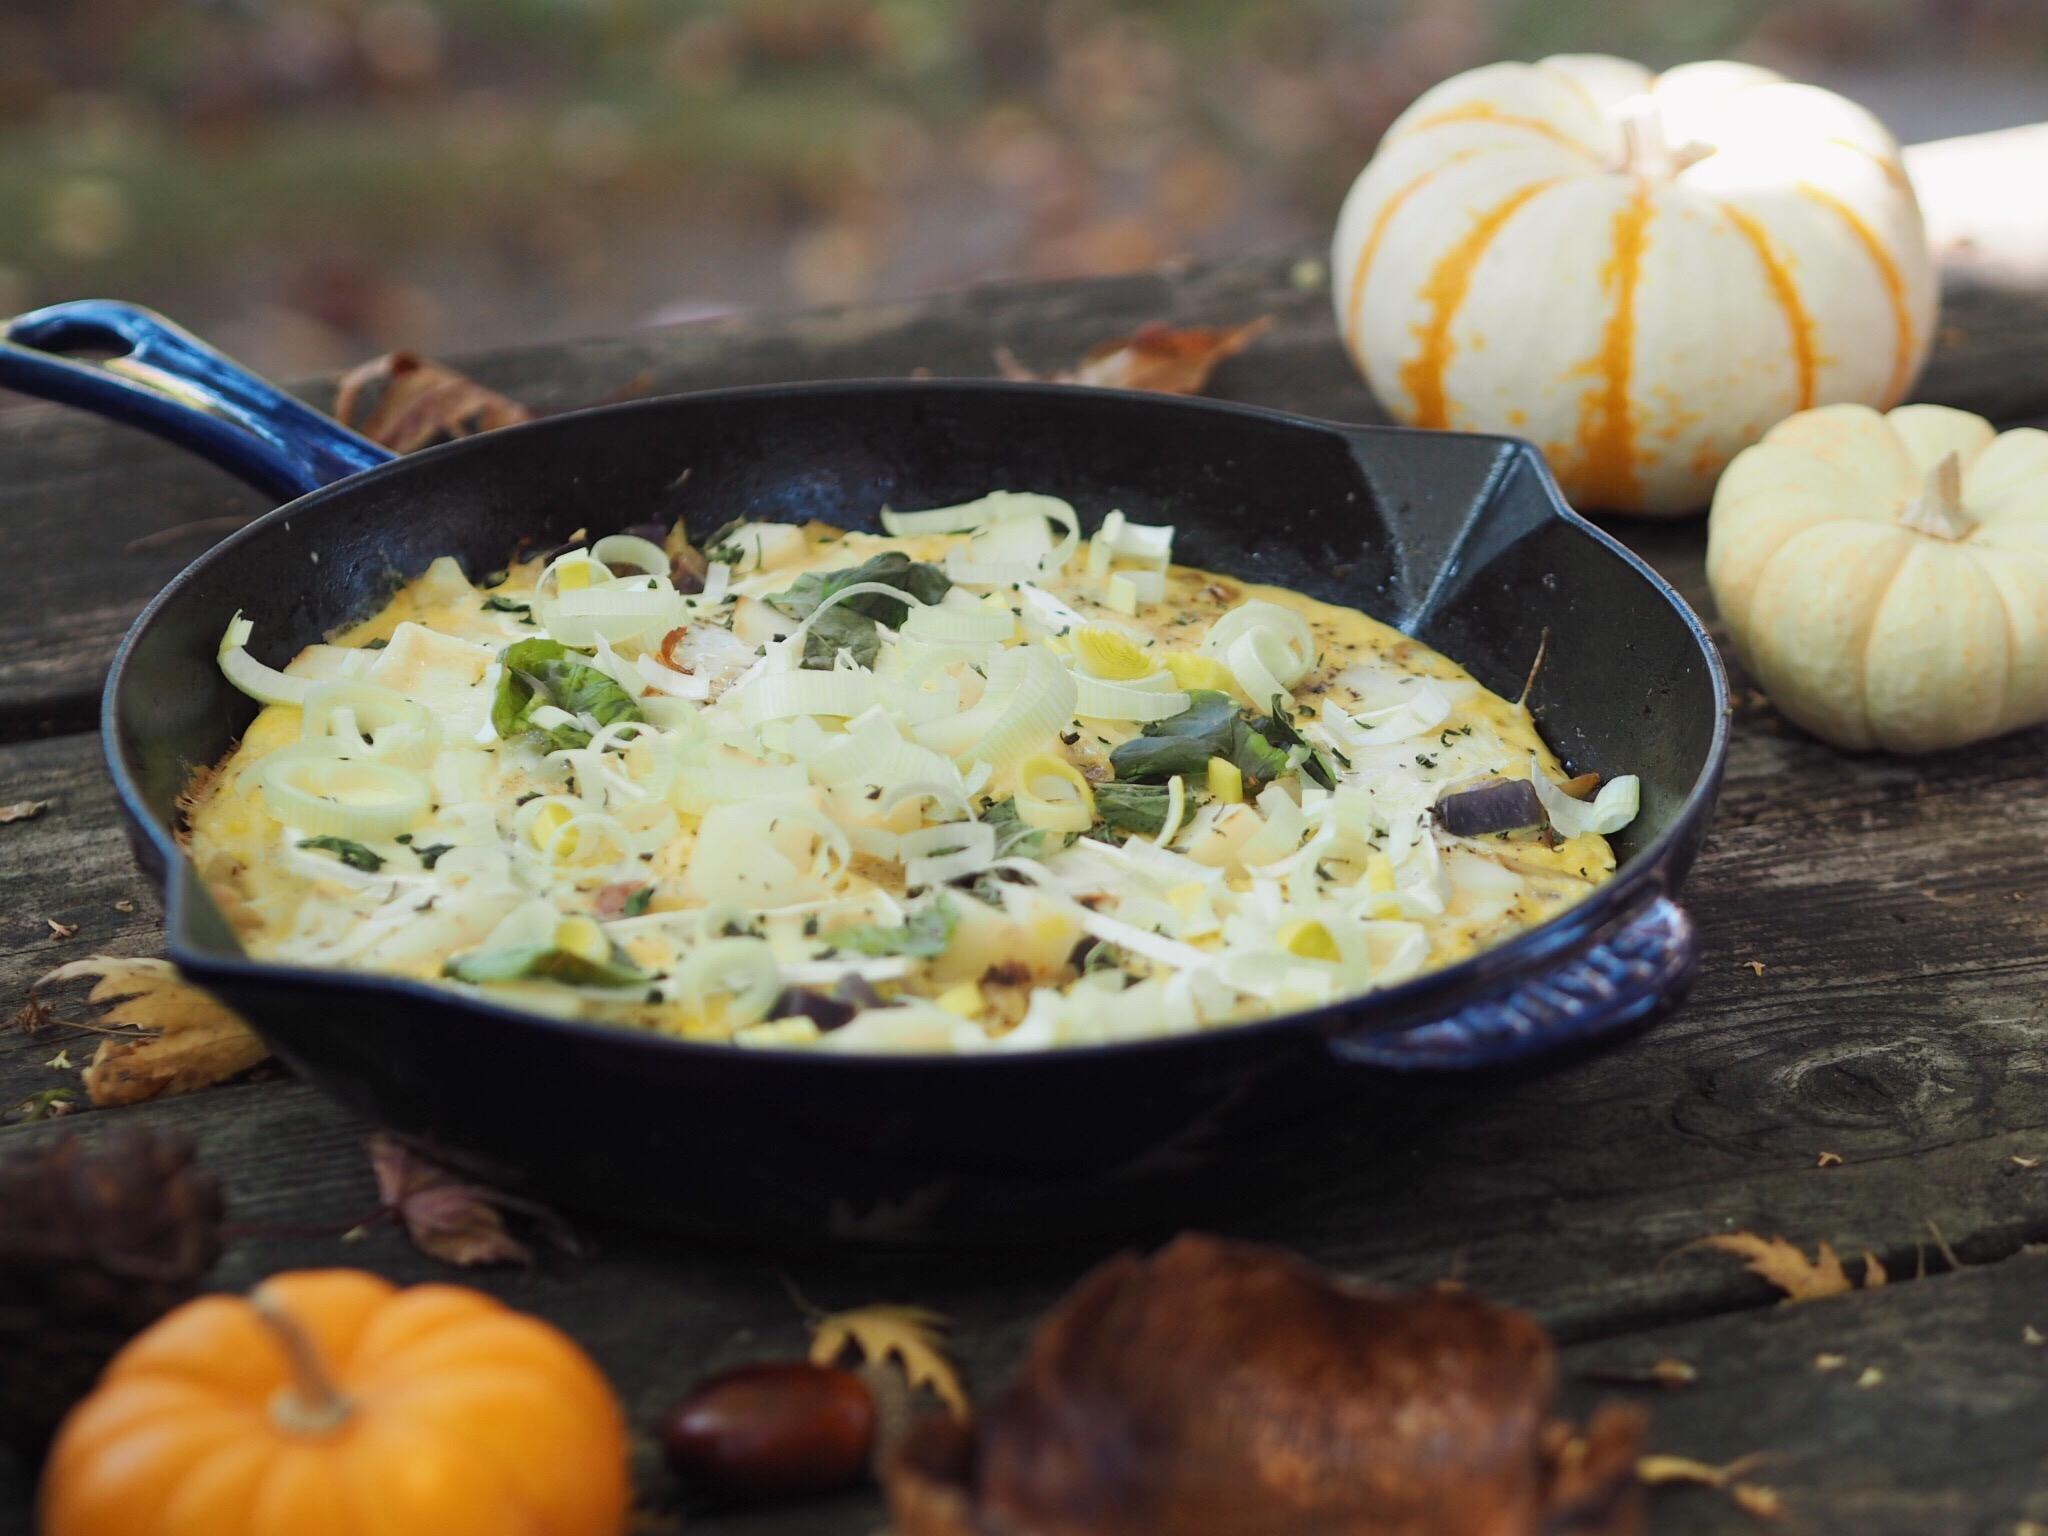 pear, brie, frittata, fall foods